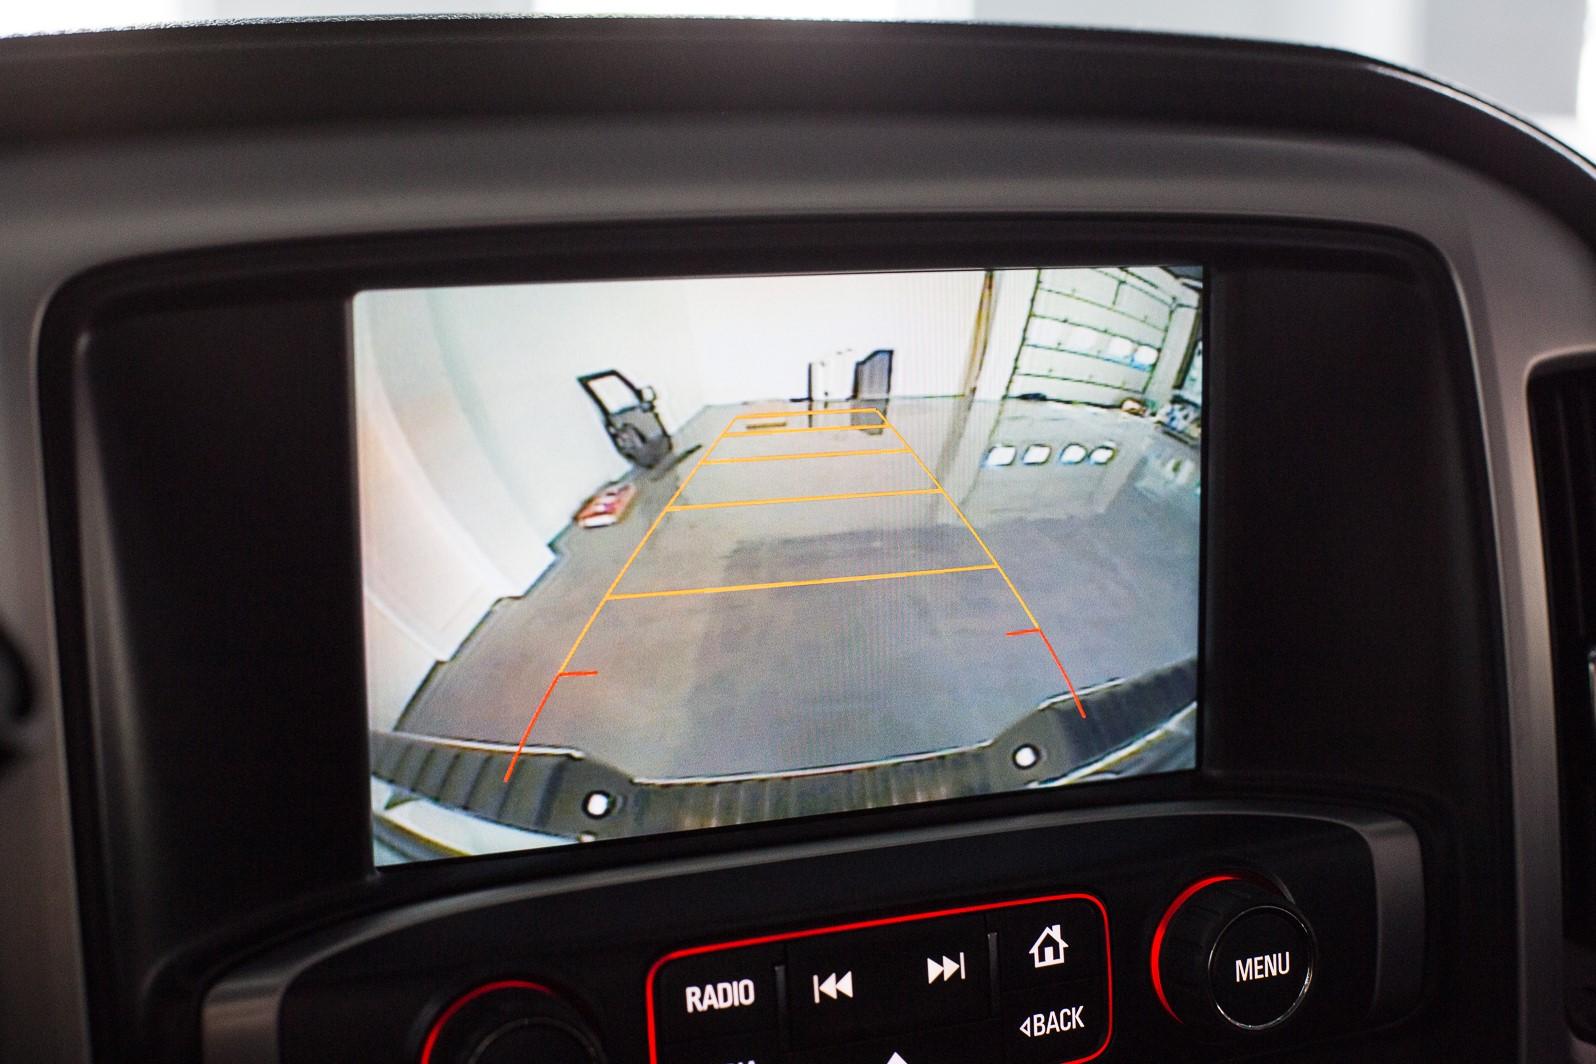 2016 GMC Sierra 1500 Crew Cab full